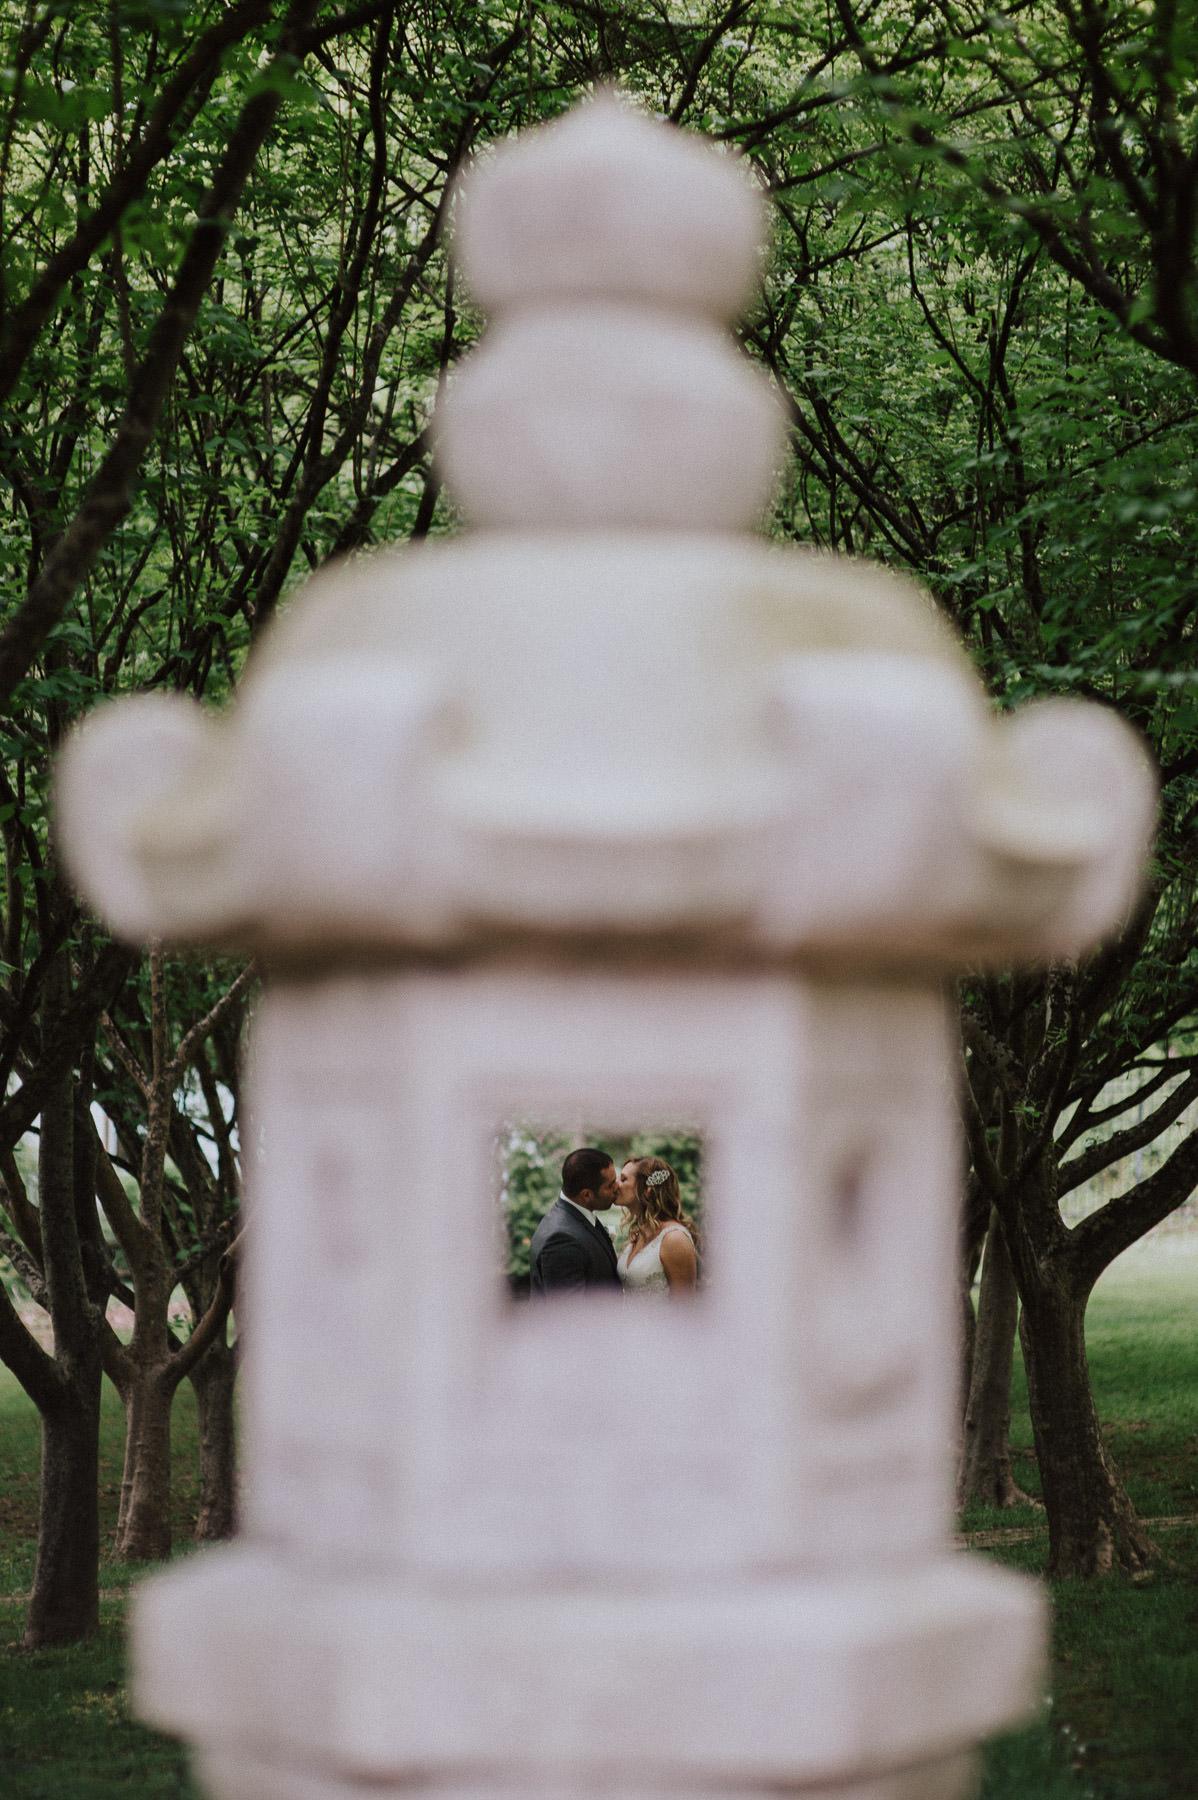 appleford-estate-wedding-photography-47.jpg